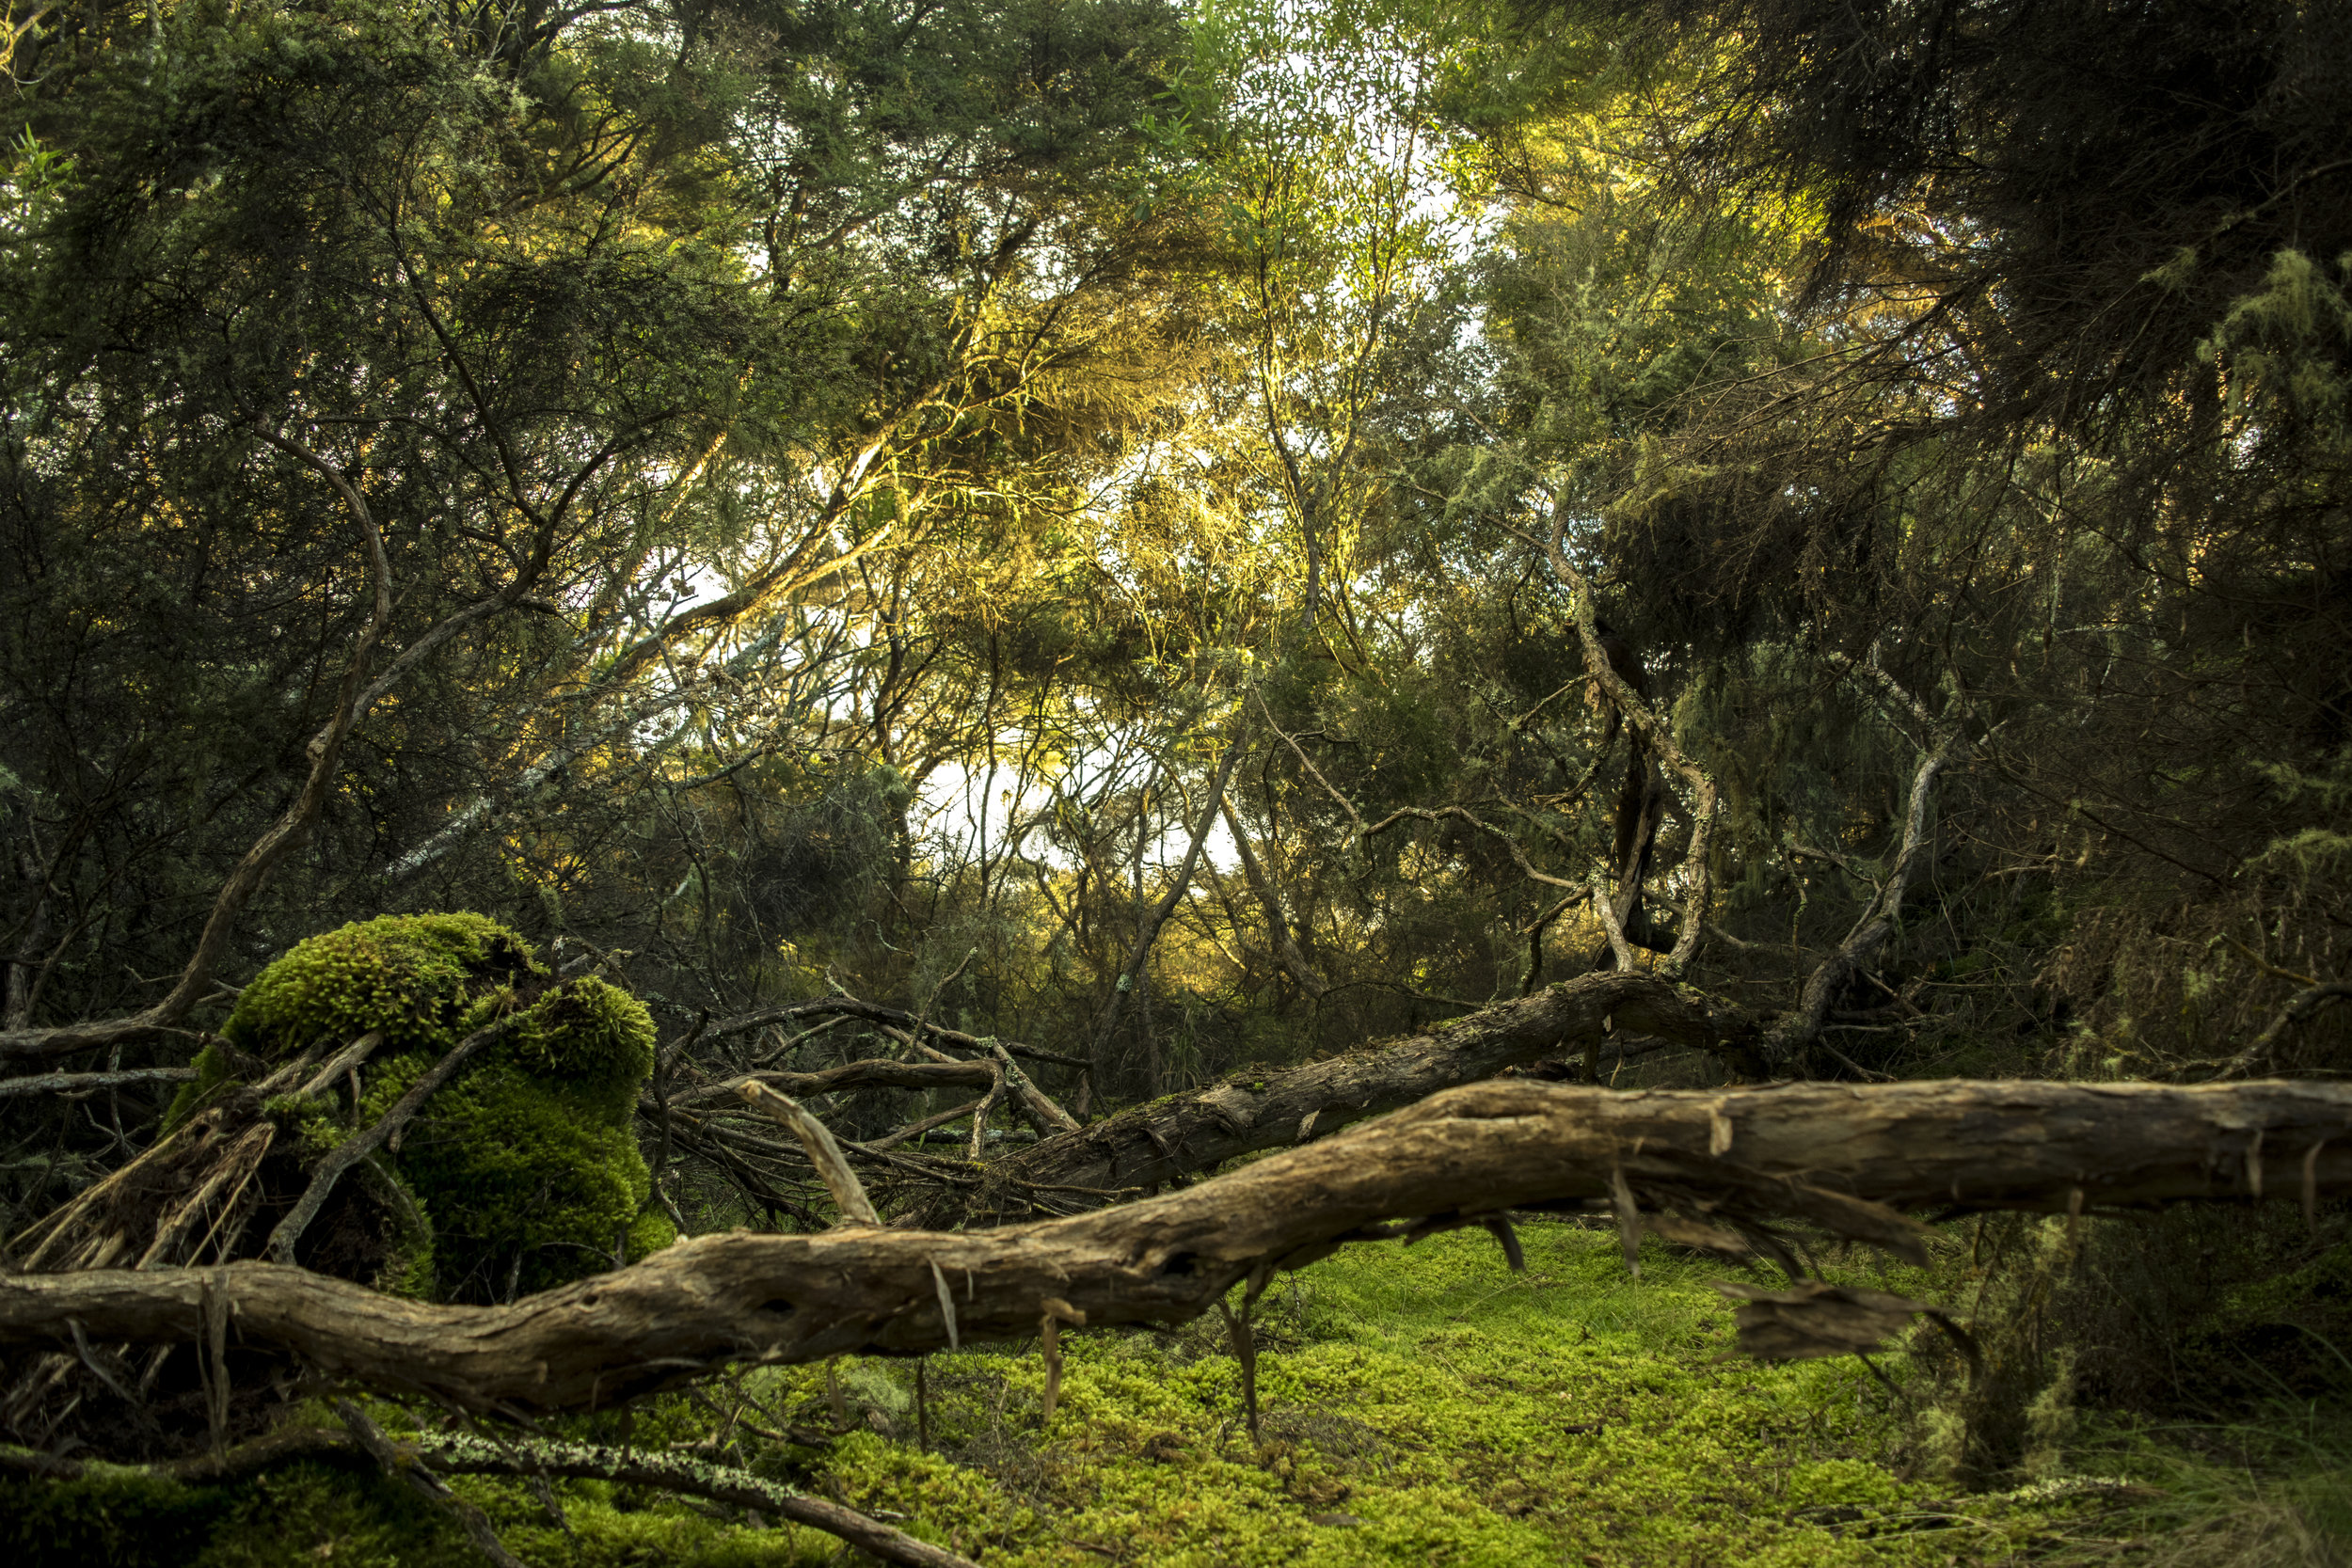 Frostgrave: Ghost Archipelago Bestiary - A veritable cavalcade of carnivorous creatures